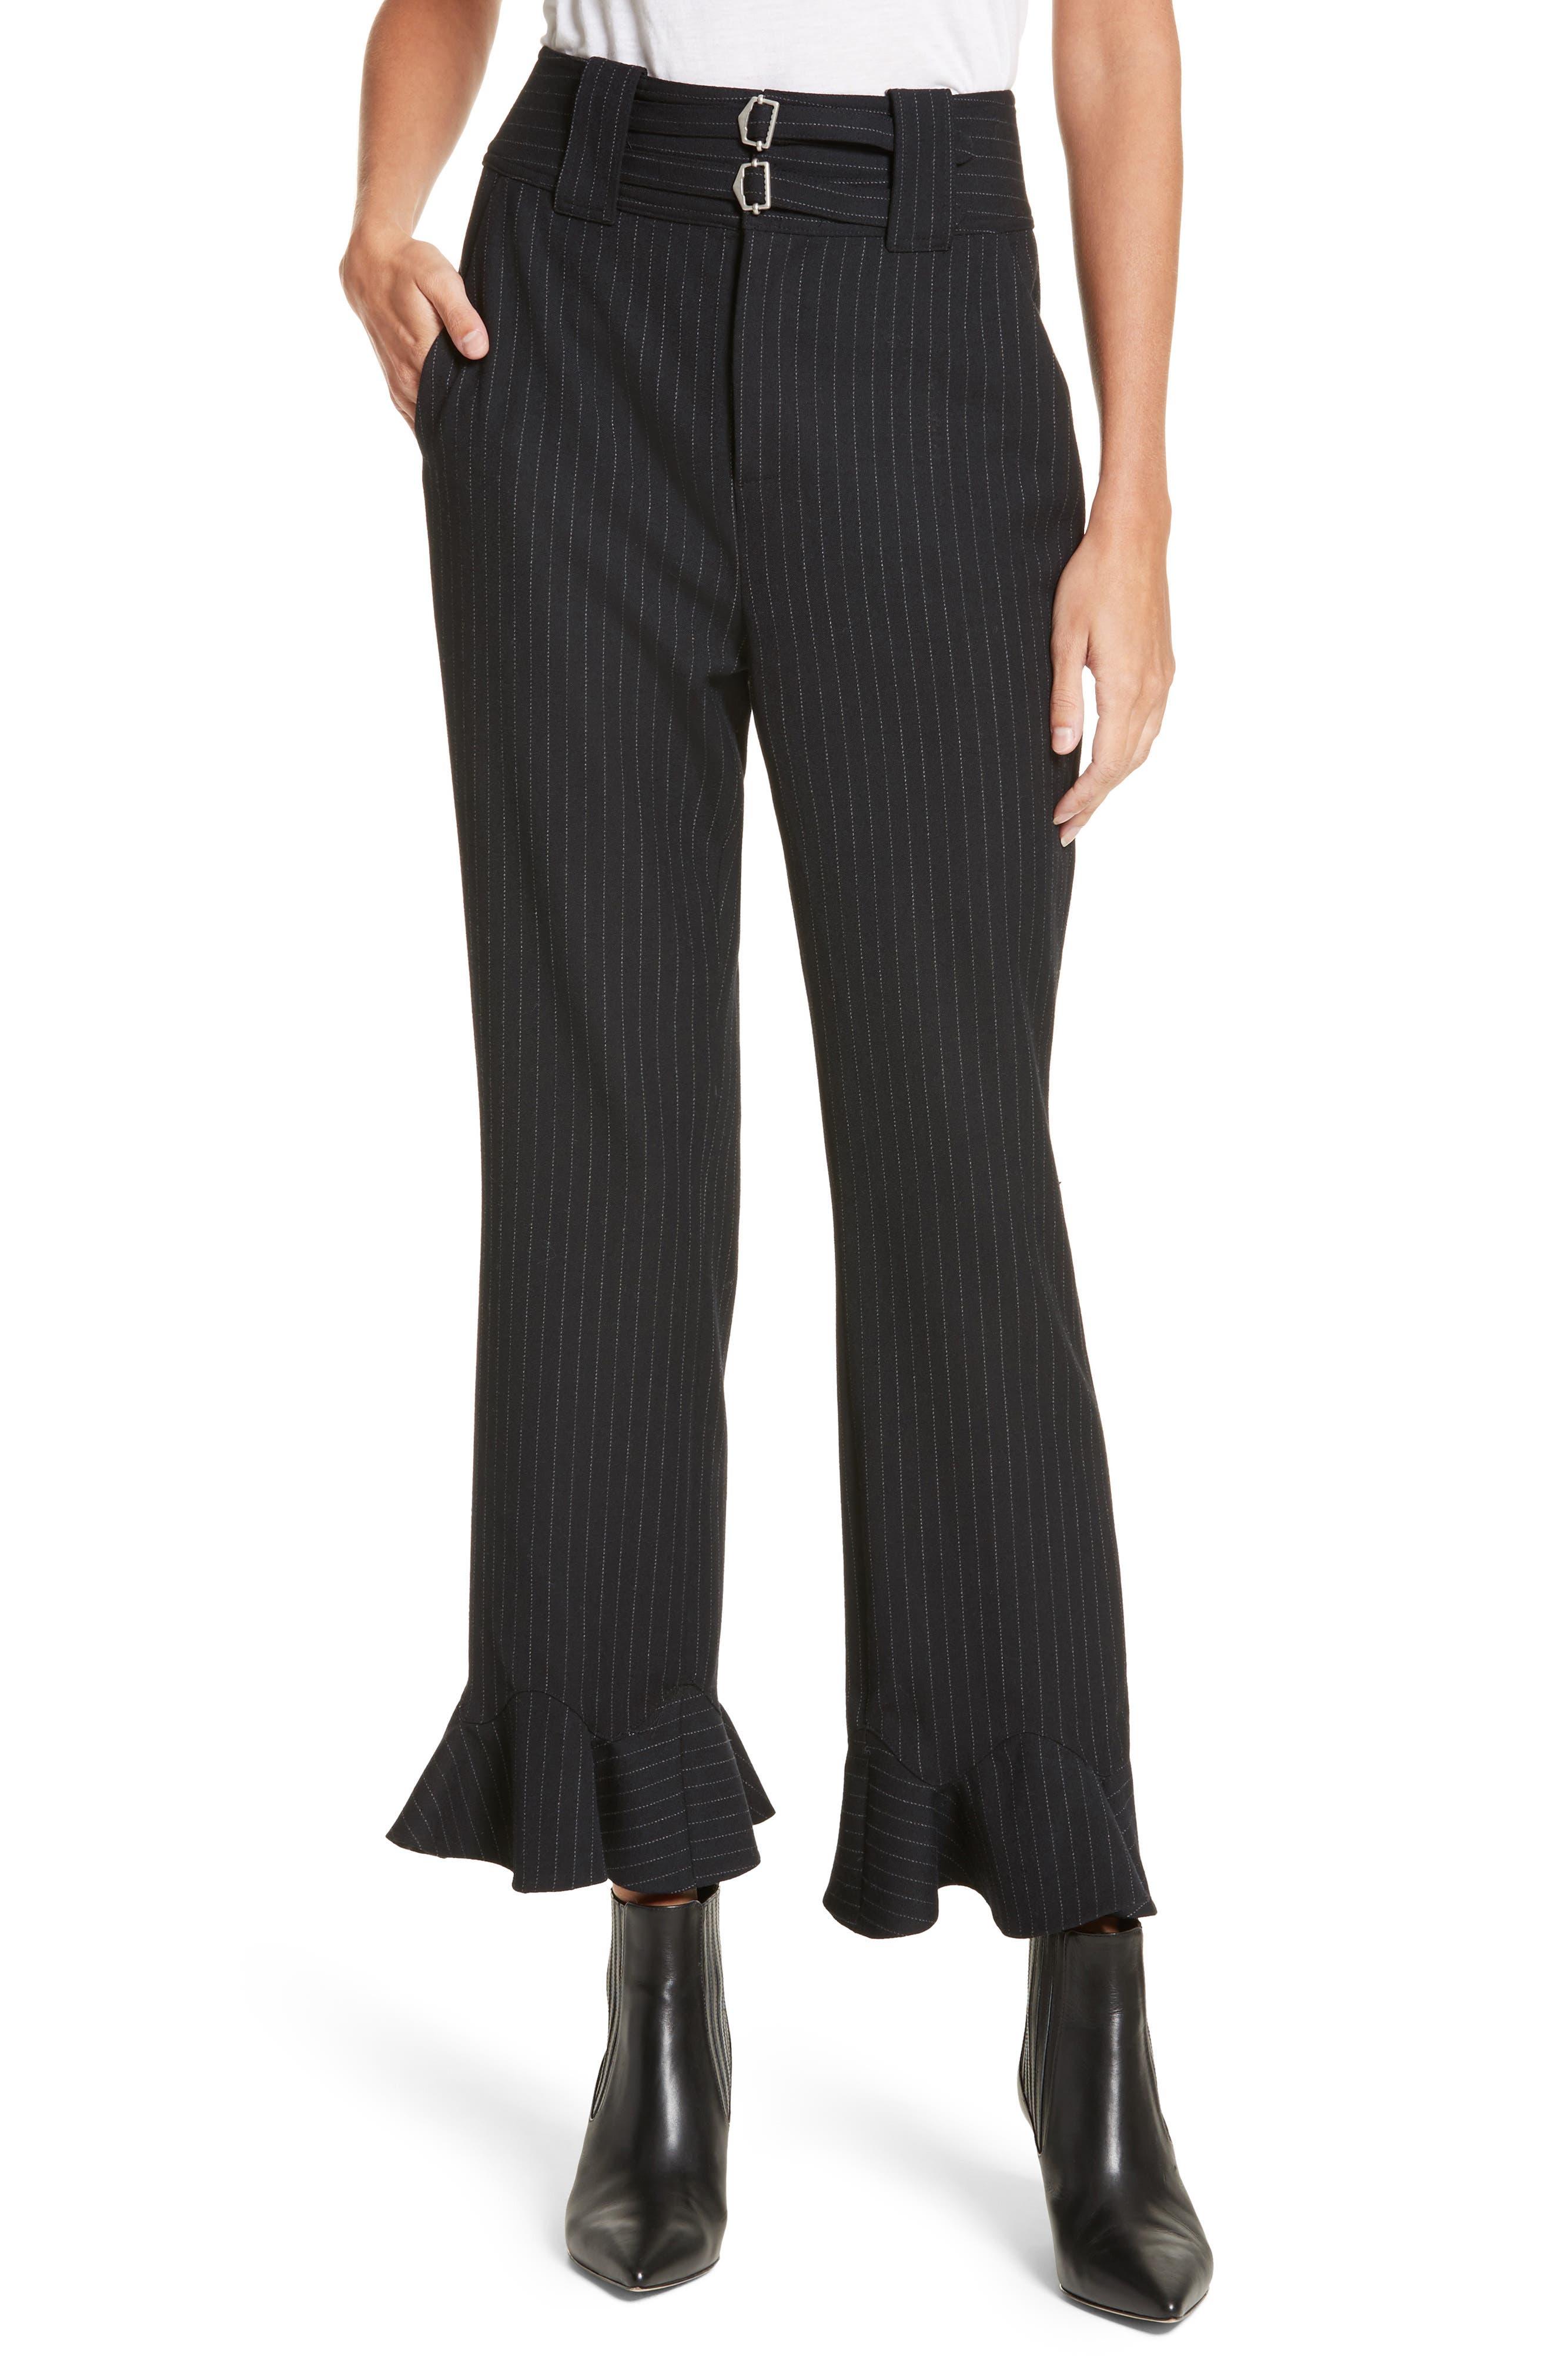 Alternate Image 1 Selected - Rebecca Taylor Pinstripe Ruffle Pants